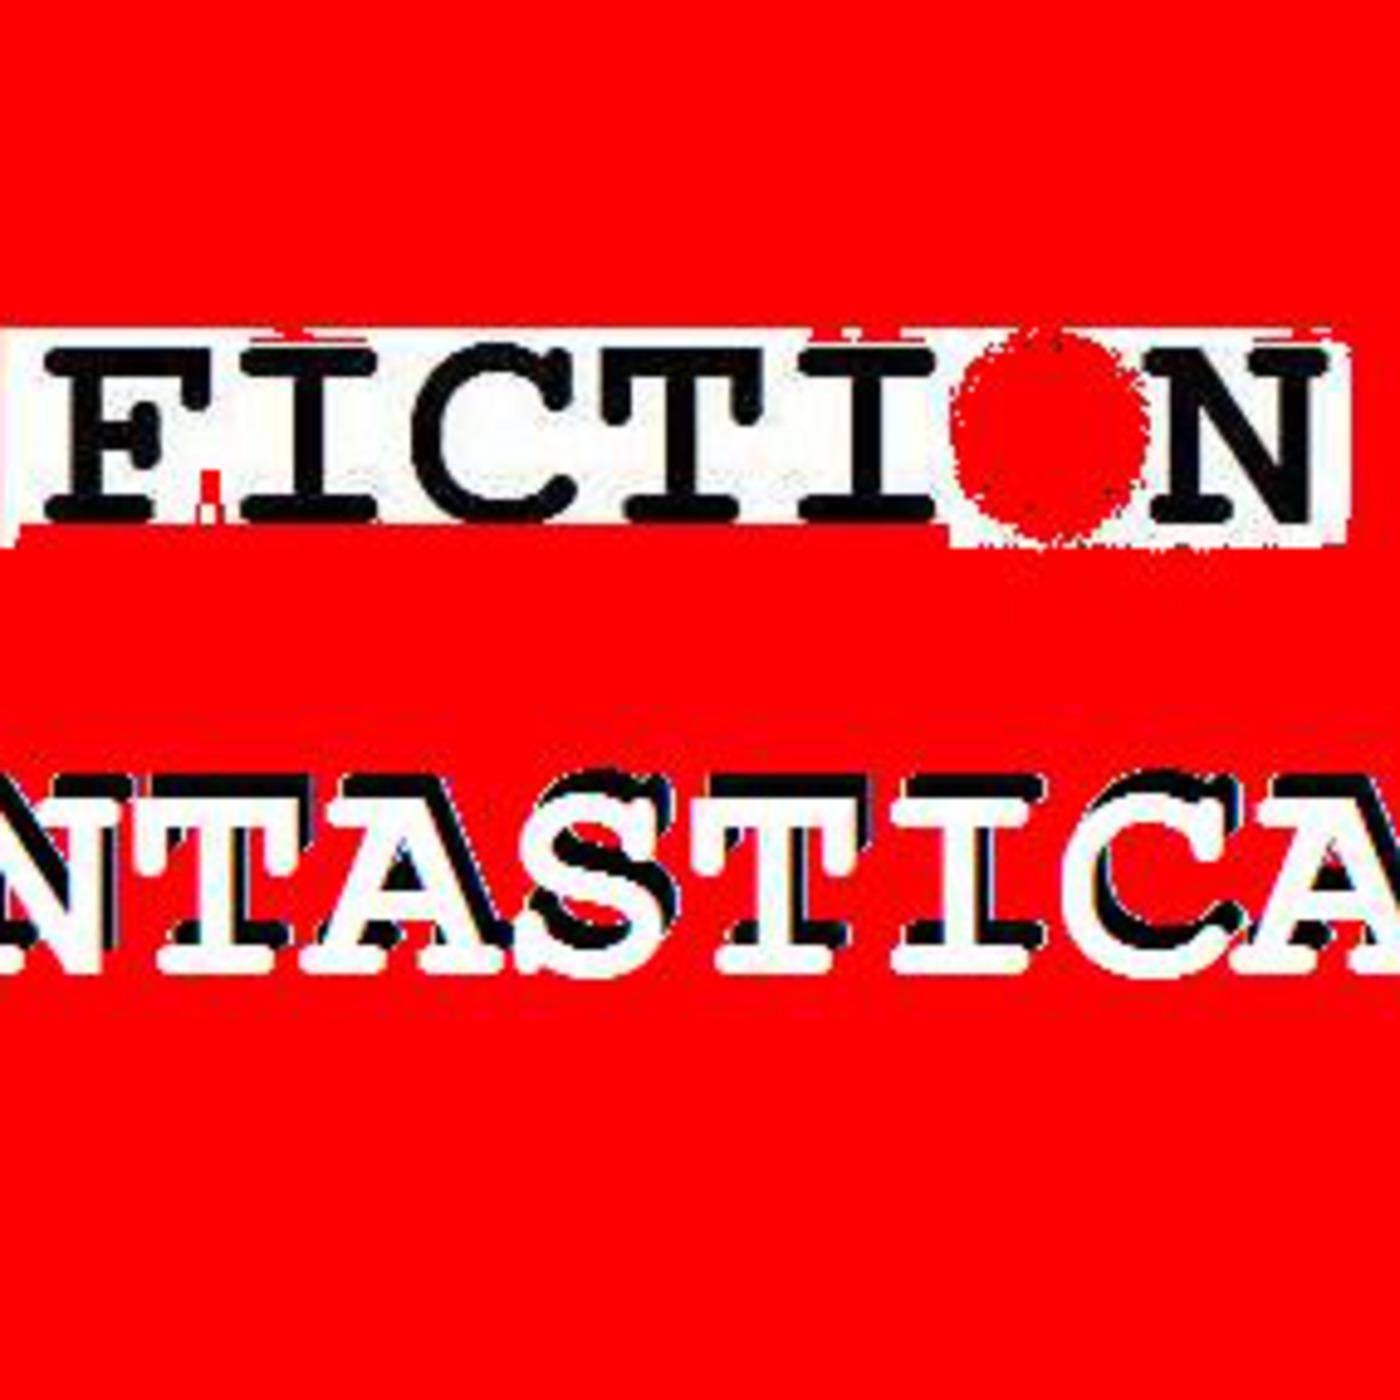 FictionFantasticast